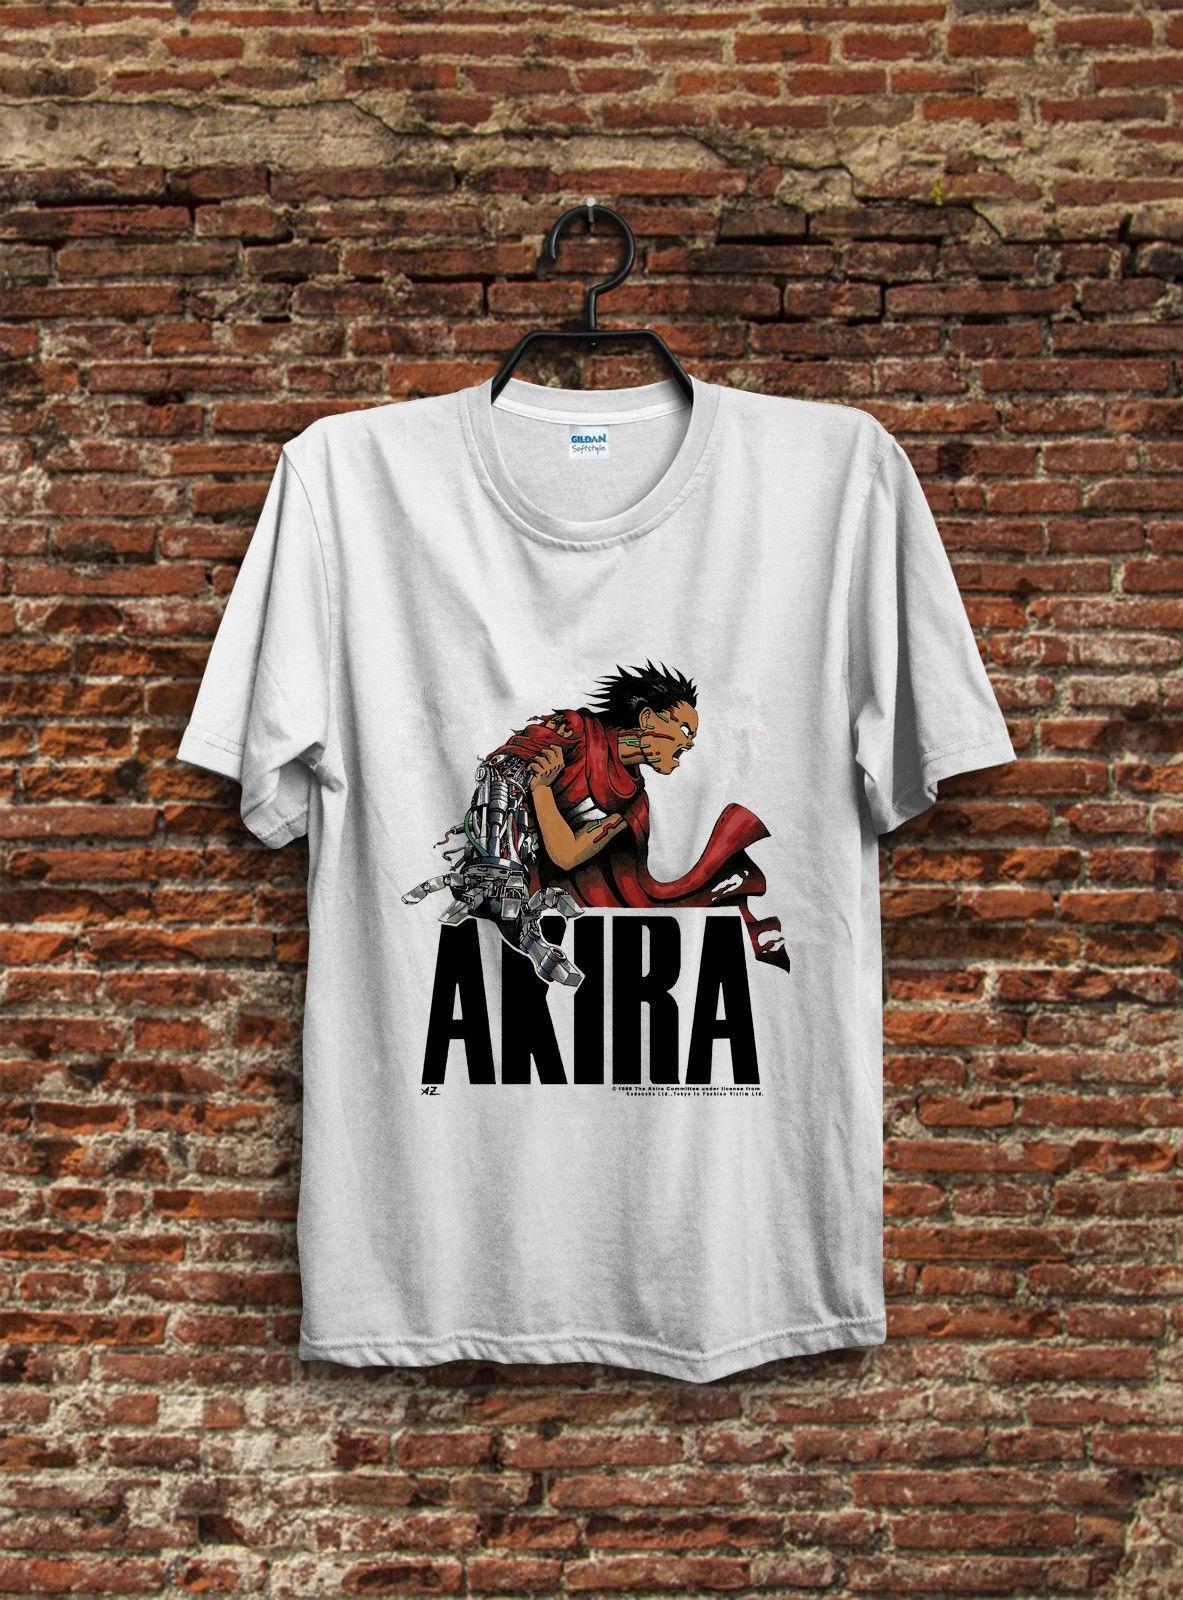 f772ffdd816 Vintage Akira T Shirt Tetsuo Shima 1988 Fashion Victim Anime Ghost In The  Shell 2018 Short Sleeve Cotton T Shirts Man Clothing Witty Tee Shirts Tee  Shirt ...